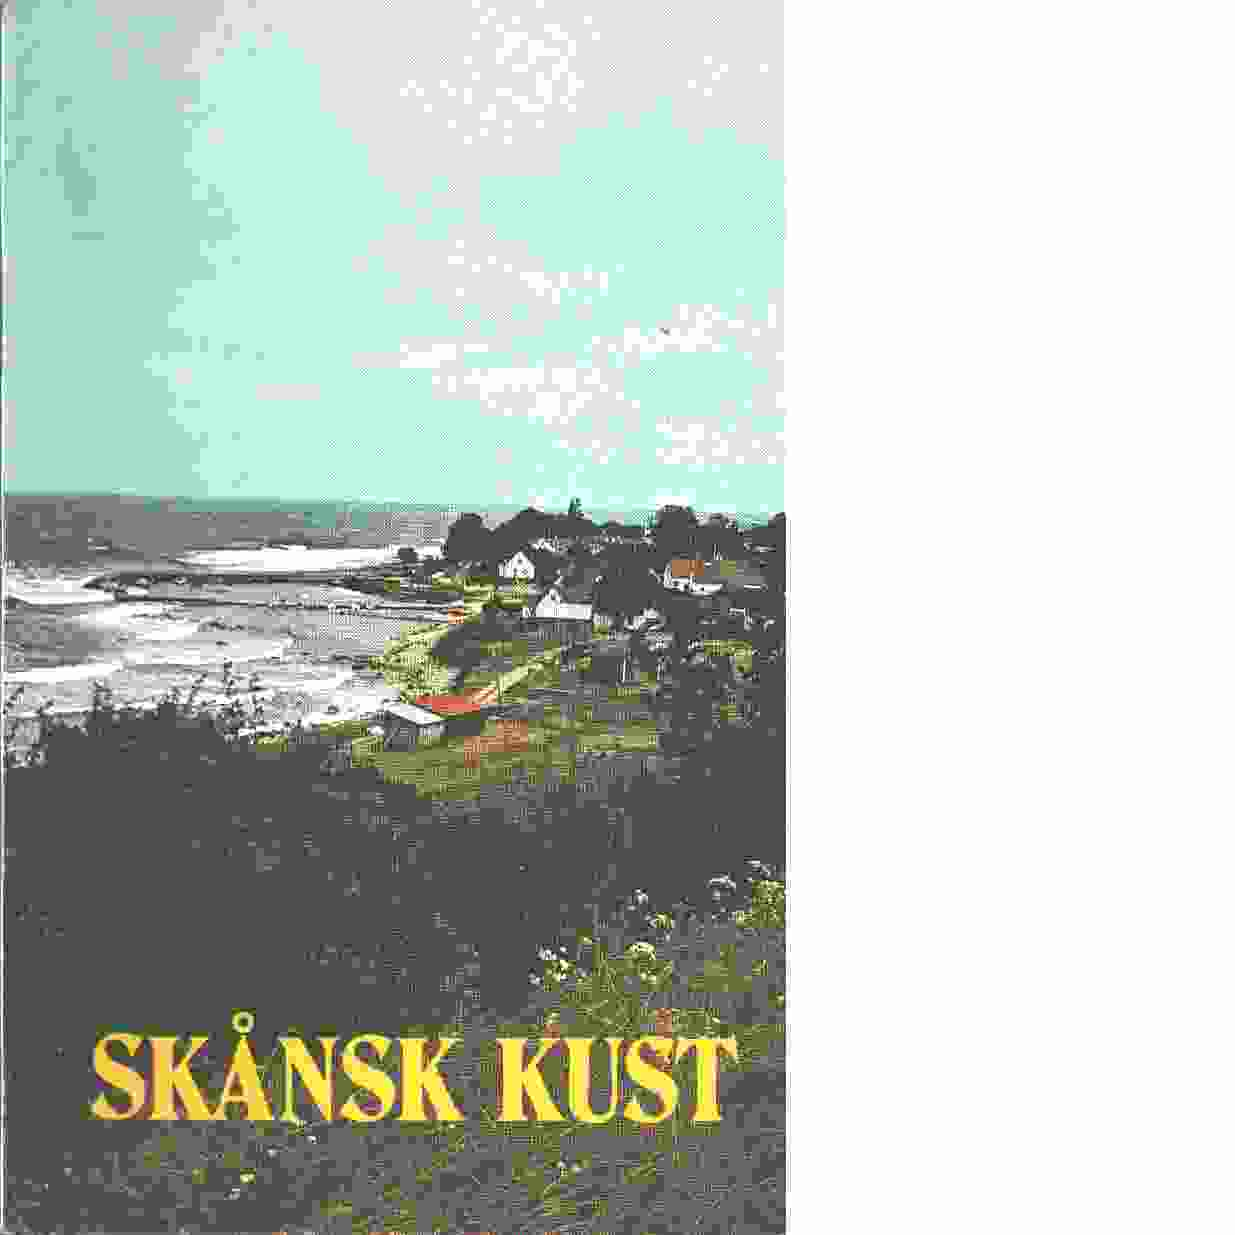 Skånsk kust - Red. Skånes hembygdsförbund